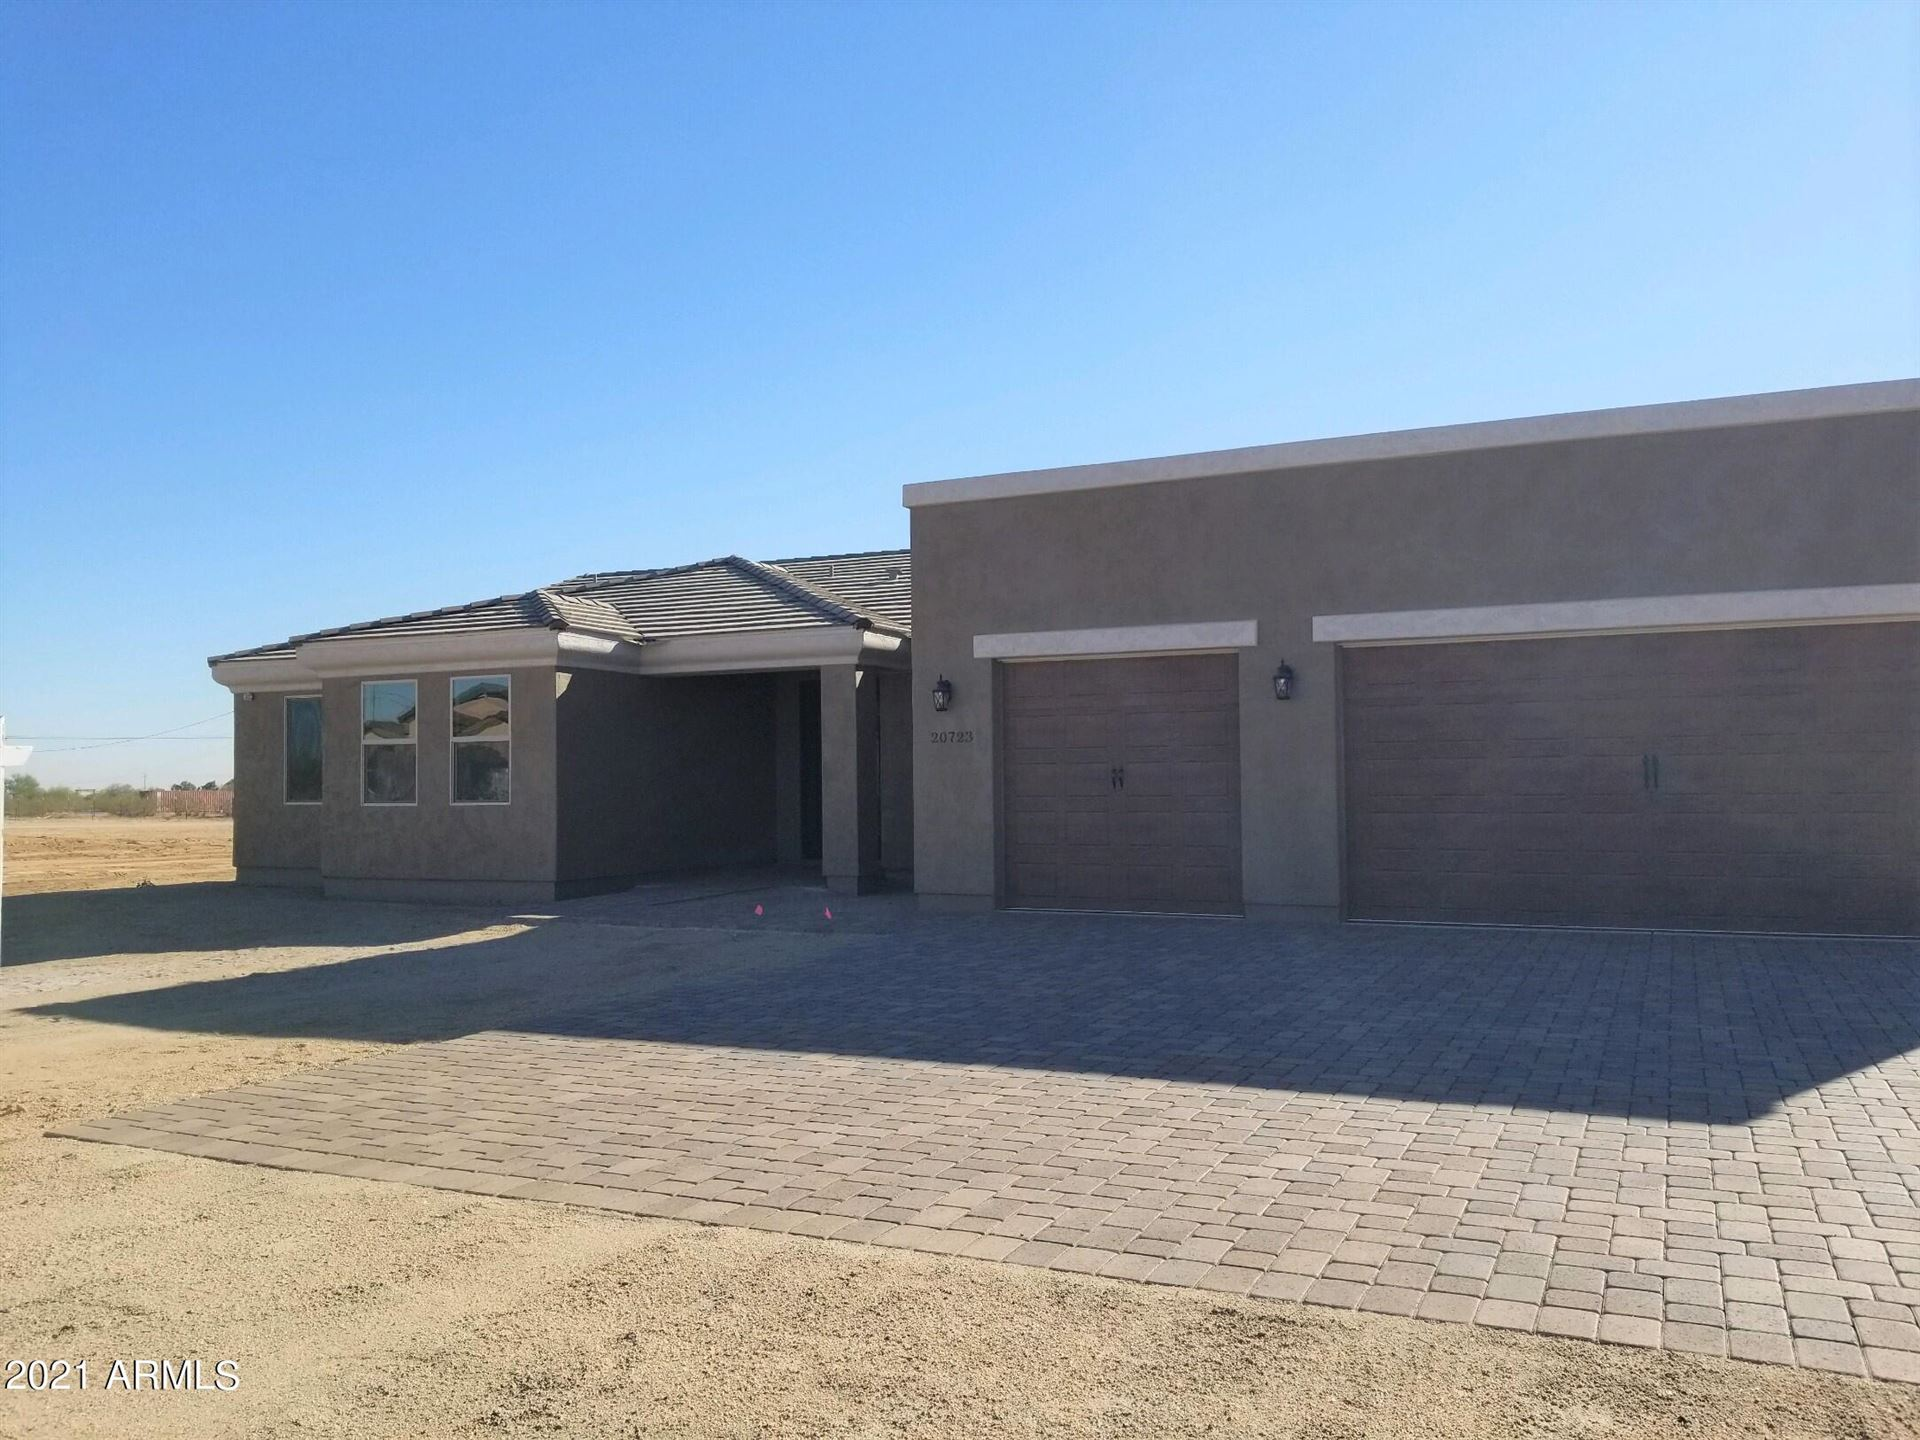 Photo of 20723 W MADRE DEL ORO Drive, Wittmann, AZ 85361 (MLS # 6278959)